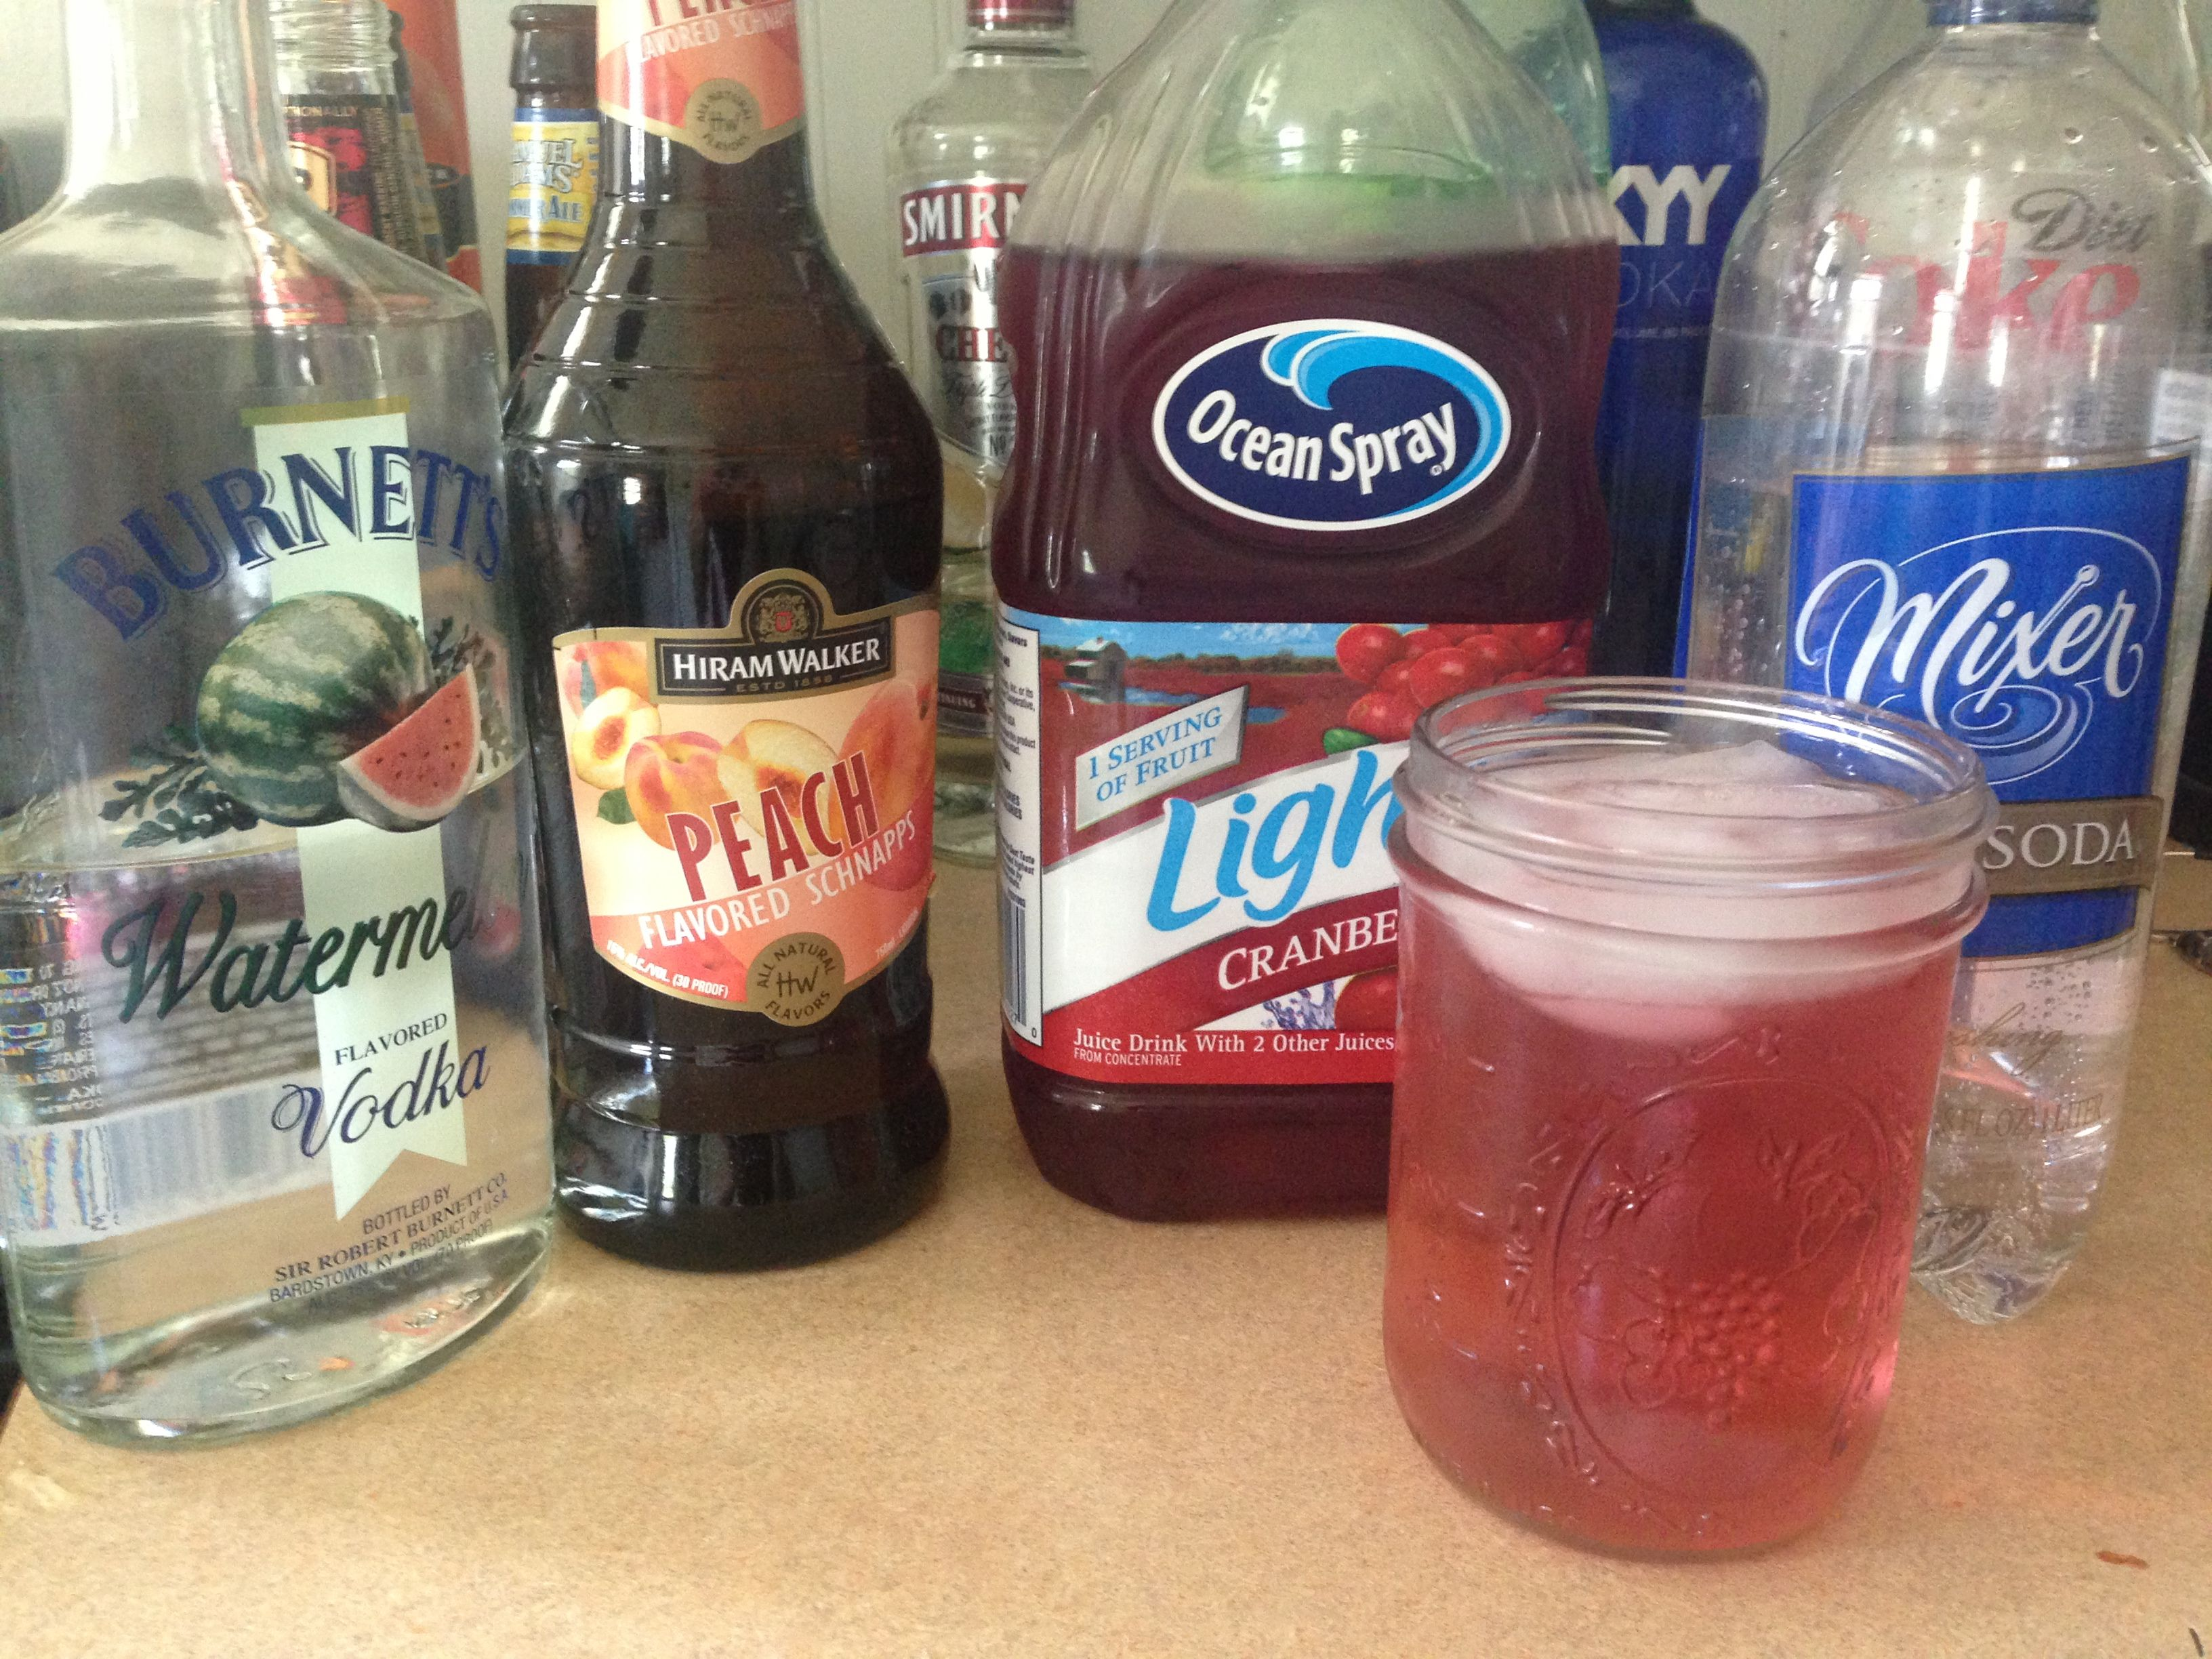 Jolly Rancher Watermelon Vodka Peach Schnapps Club Soda And A Splash Of Cranberry Juice Yum Watermelon Vodka Drinks Peach Schnapps